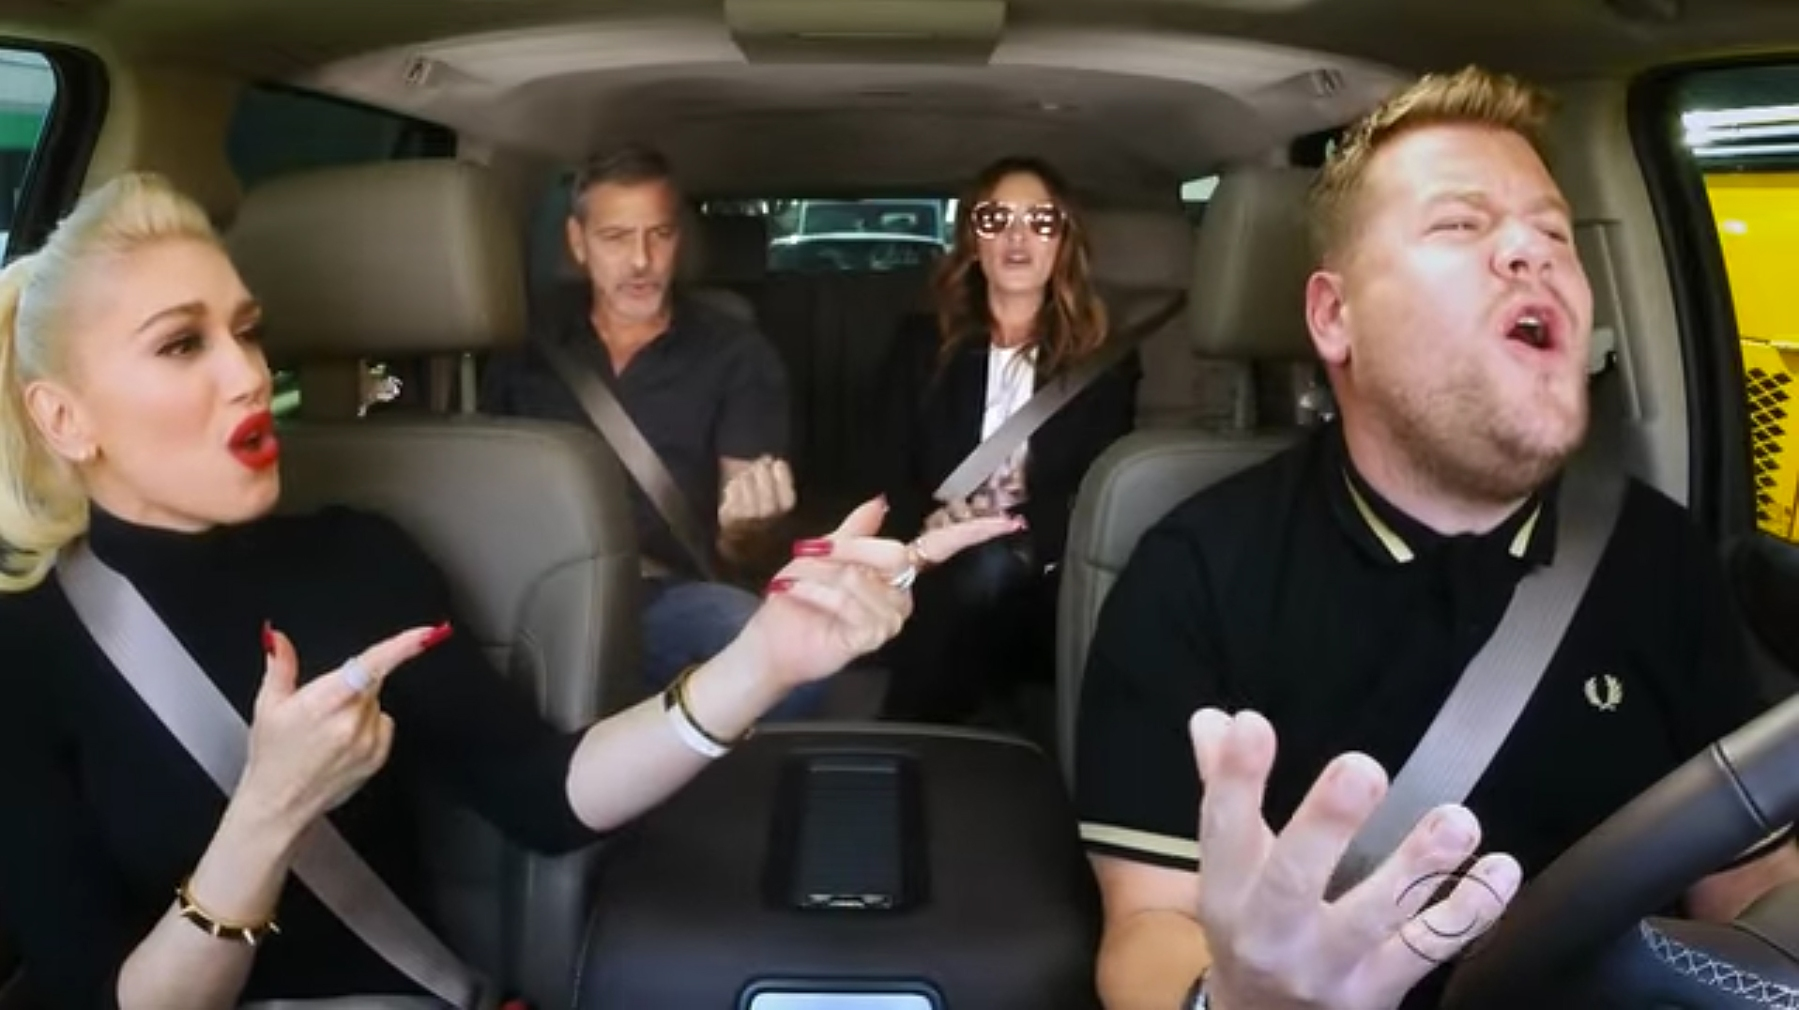 Carpool Karaoke Featuring Gwen Stefani, George Clooney, Julia Roberts